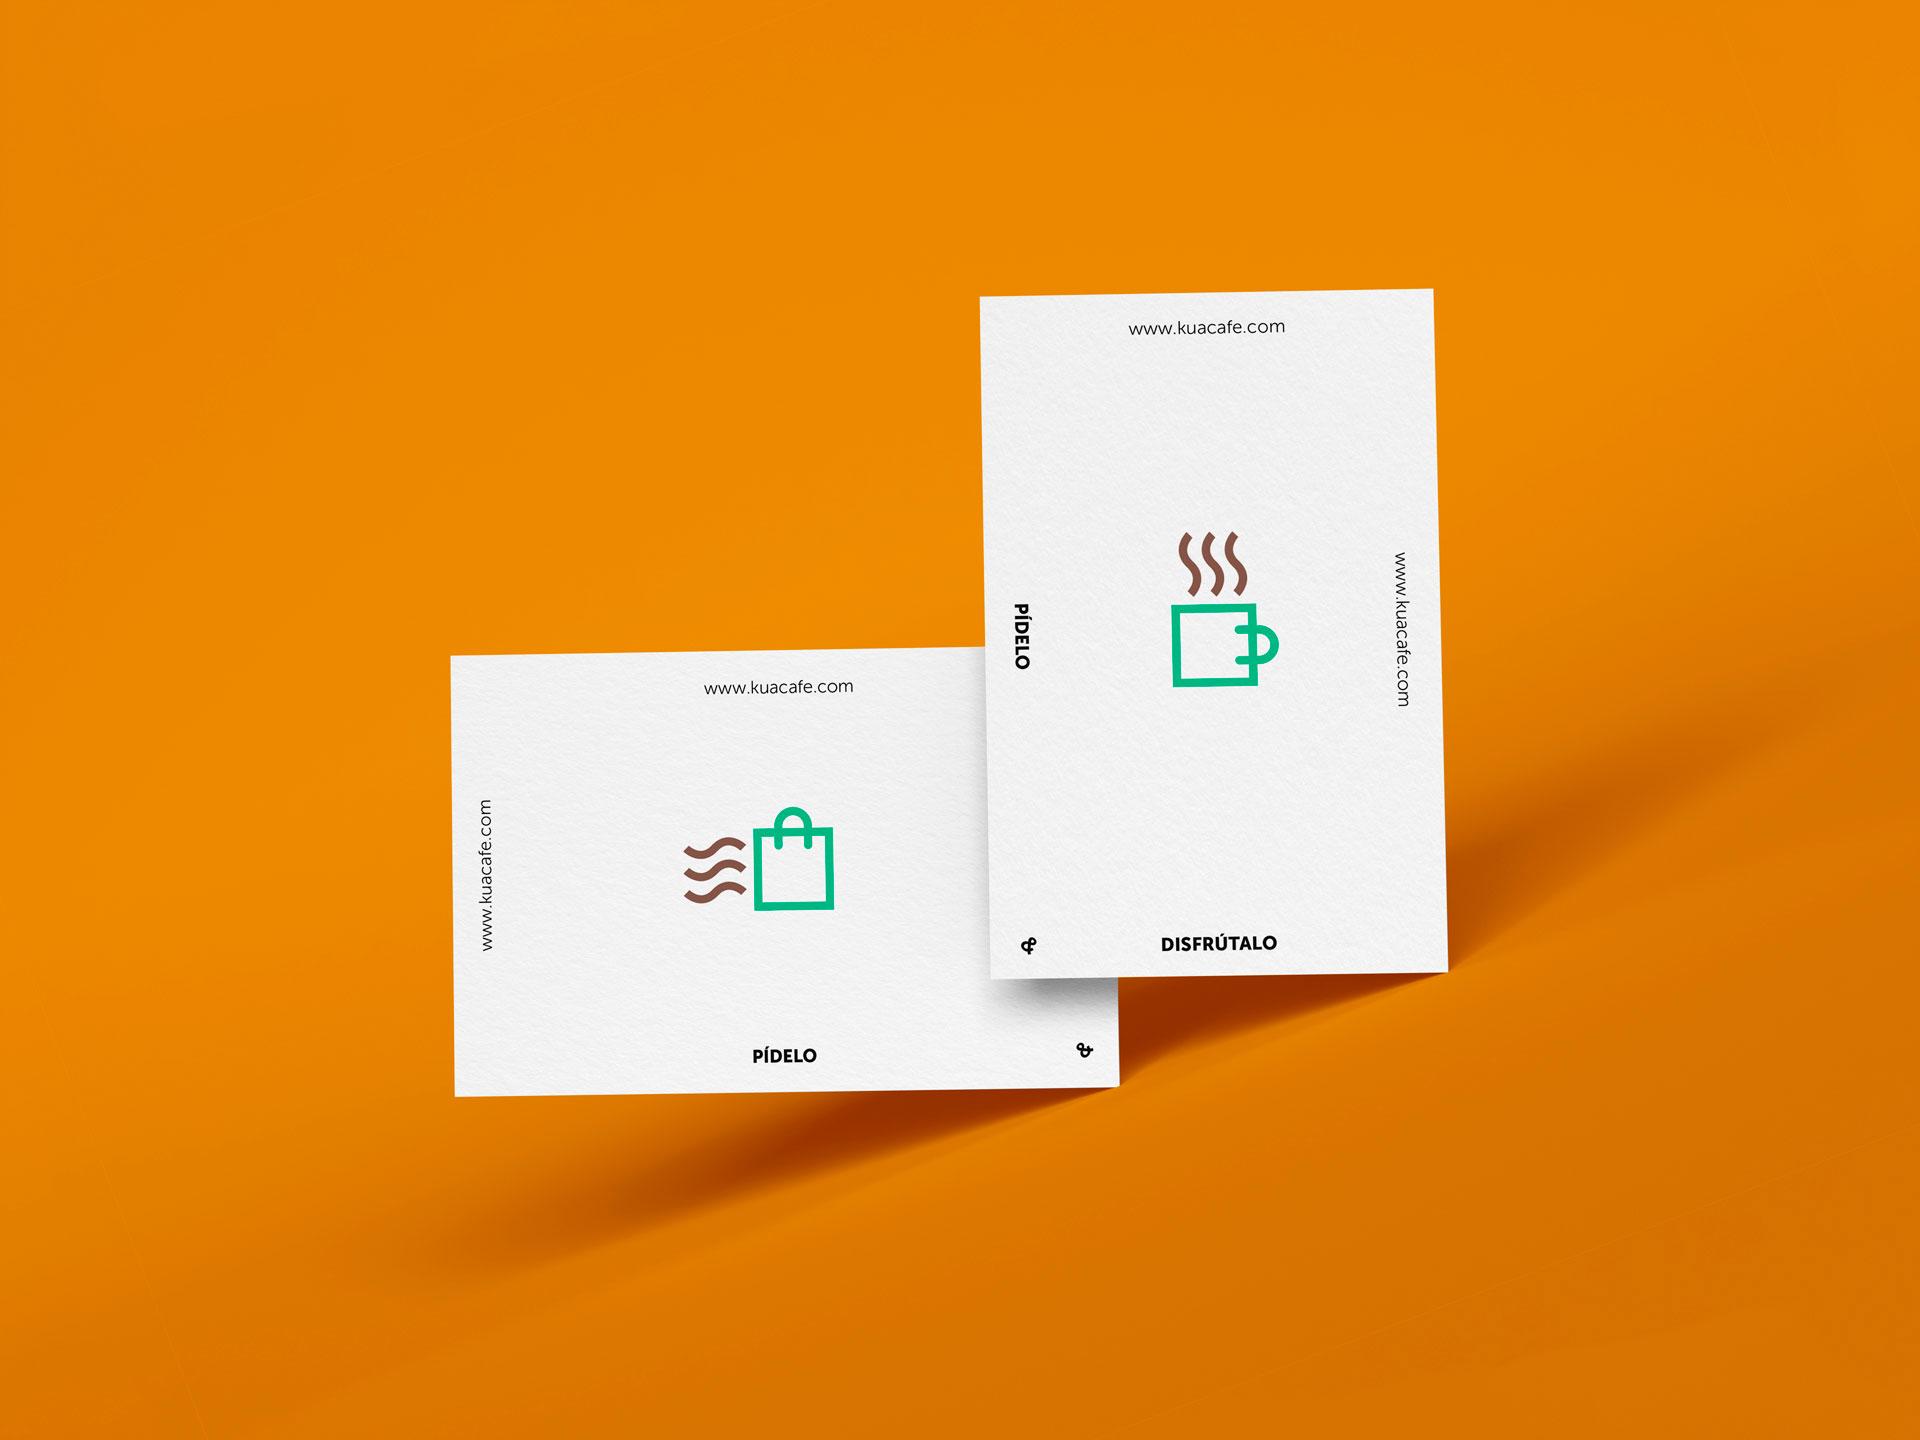 boom-agencia-marketing-digital-branding-kua-cafe-tienda-online-tarjetas-presentacion